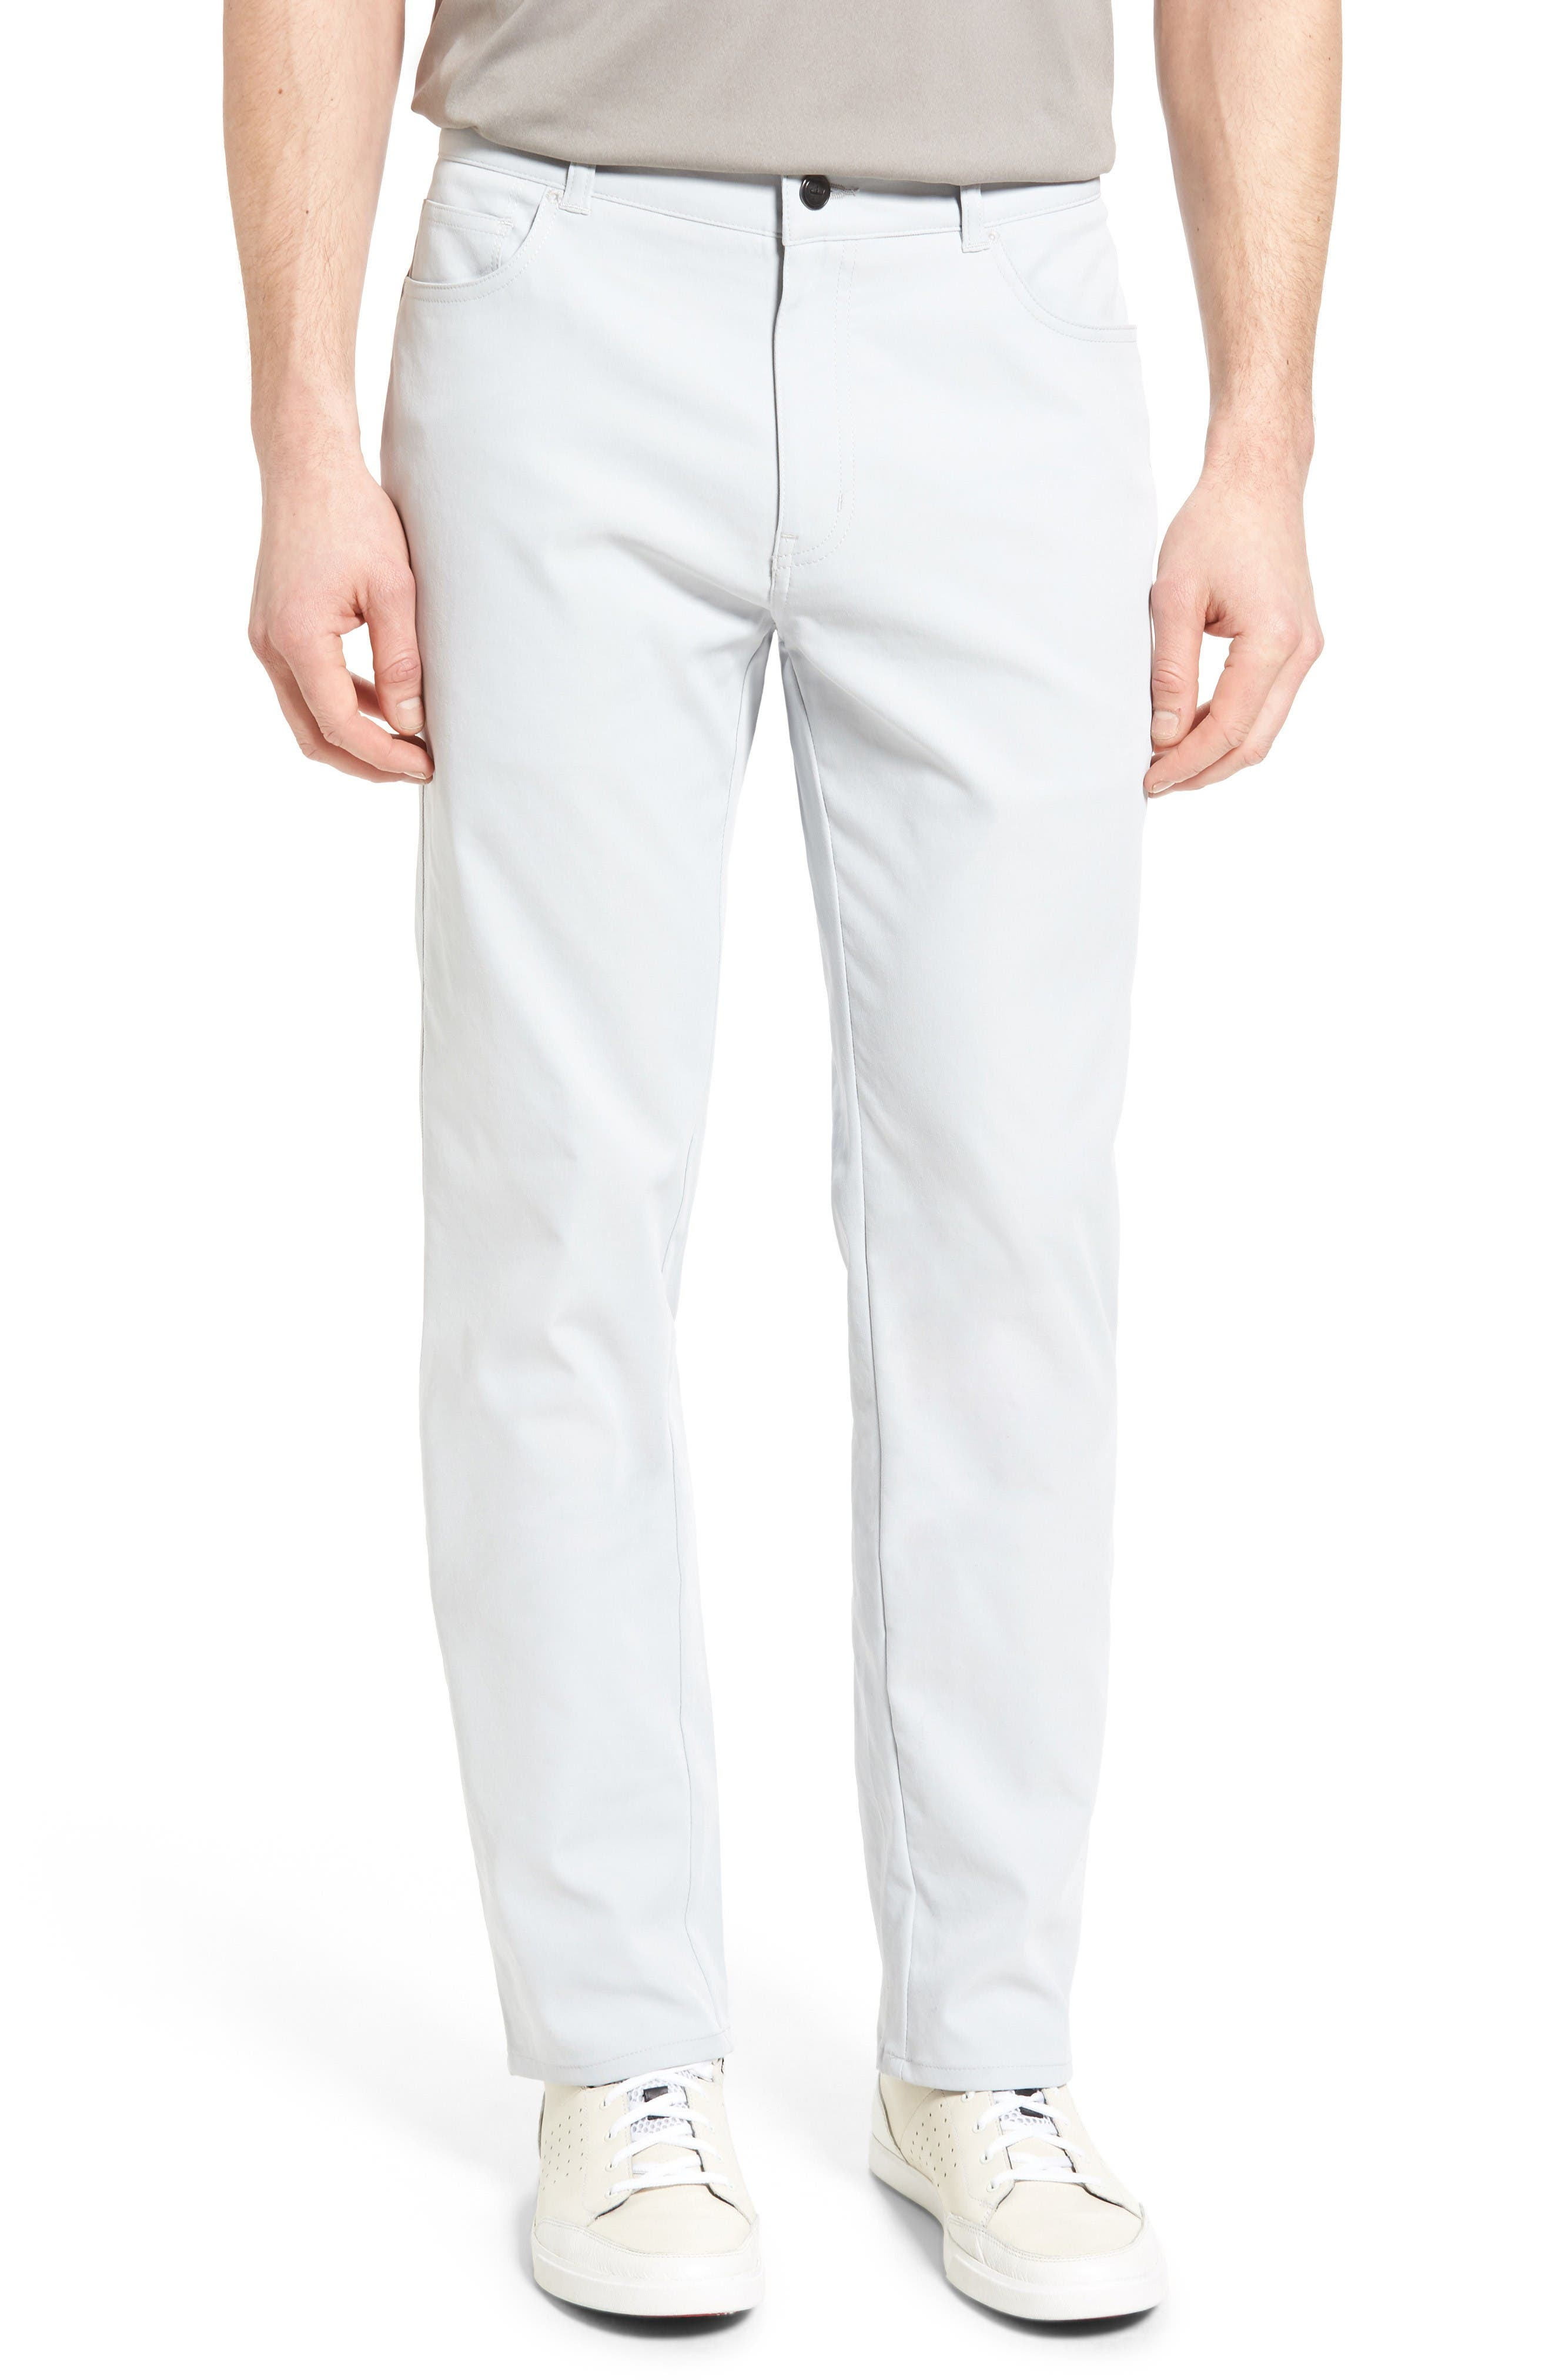 PETER MILLAR EB66 Performance Pants